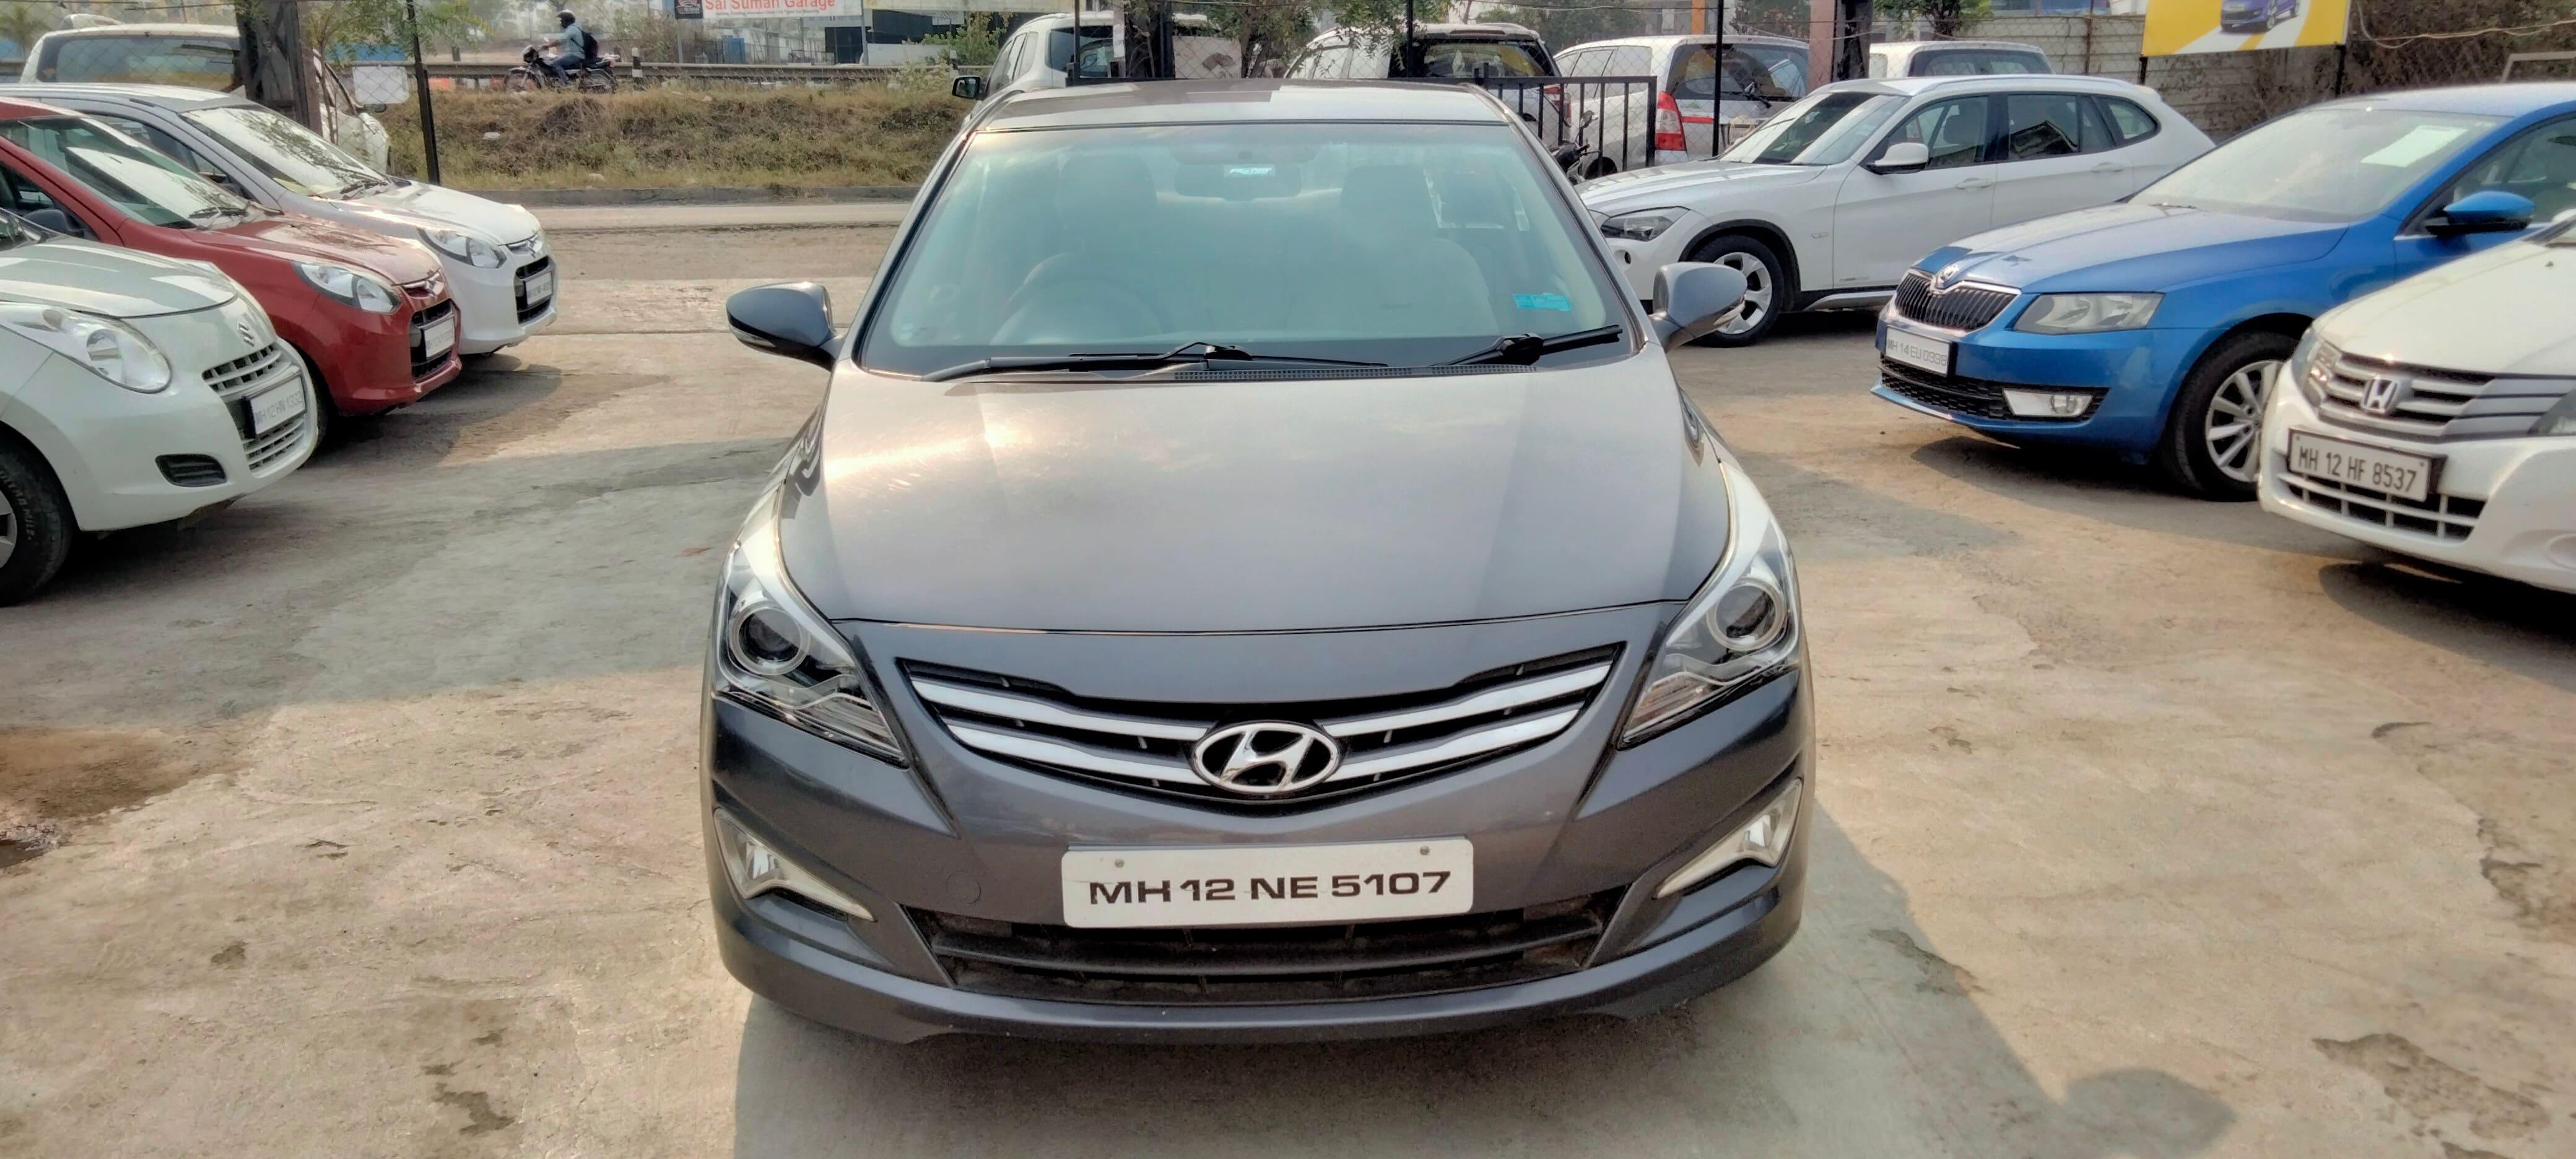 Hyundai Verna 2016-2017 1.6 VTVT S